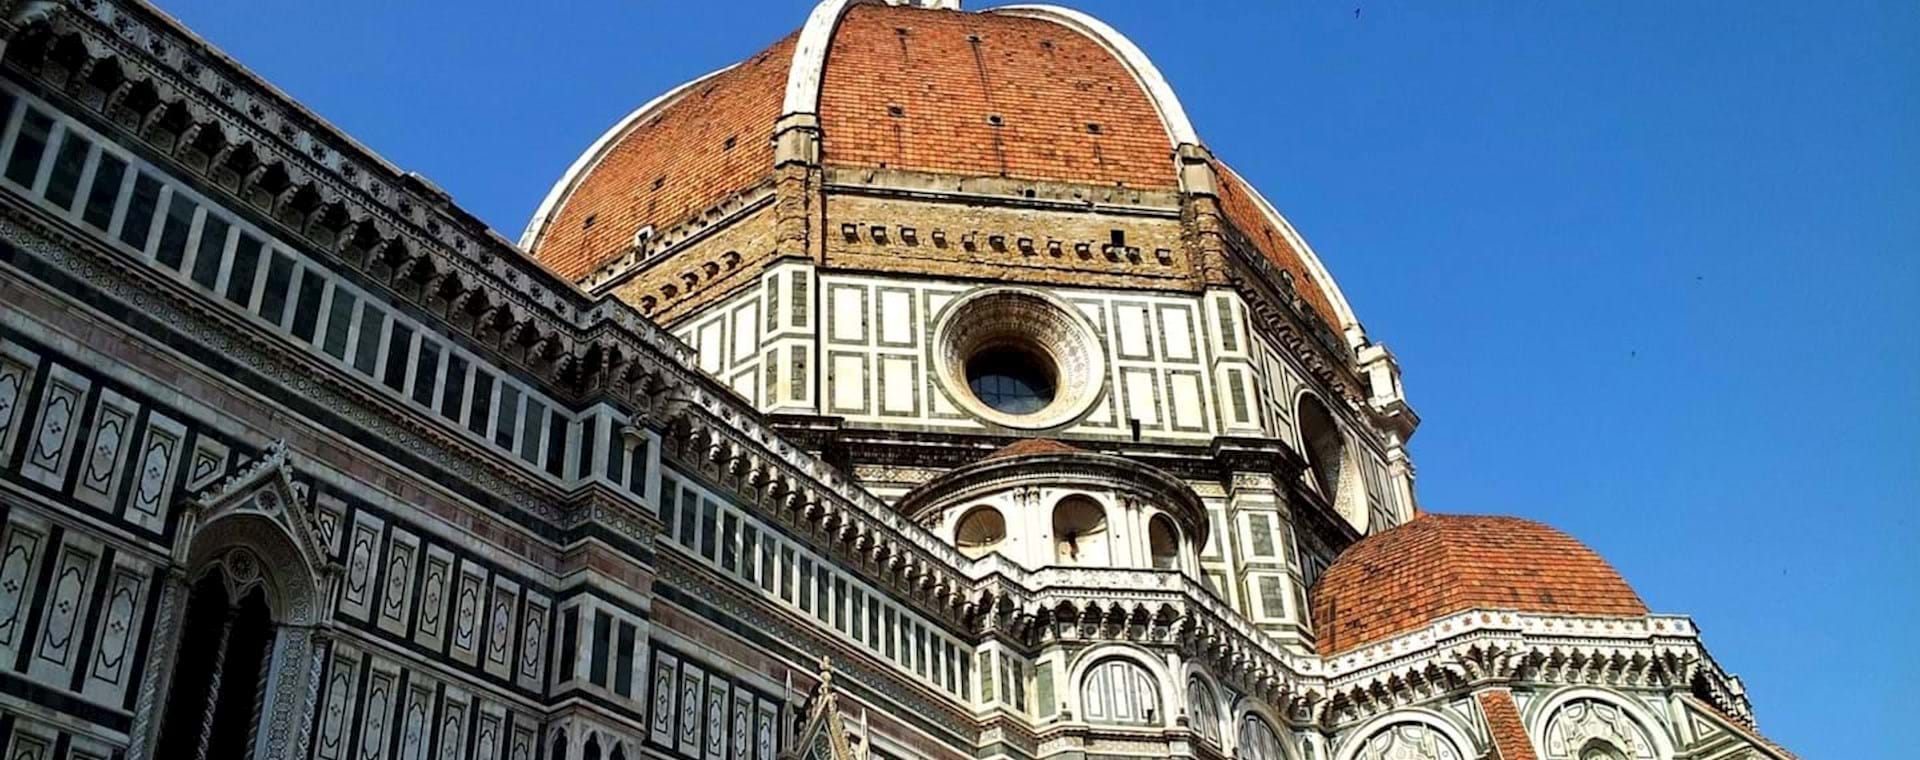 Florence Duomo Express Guided Tour